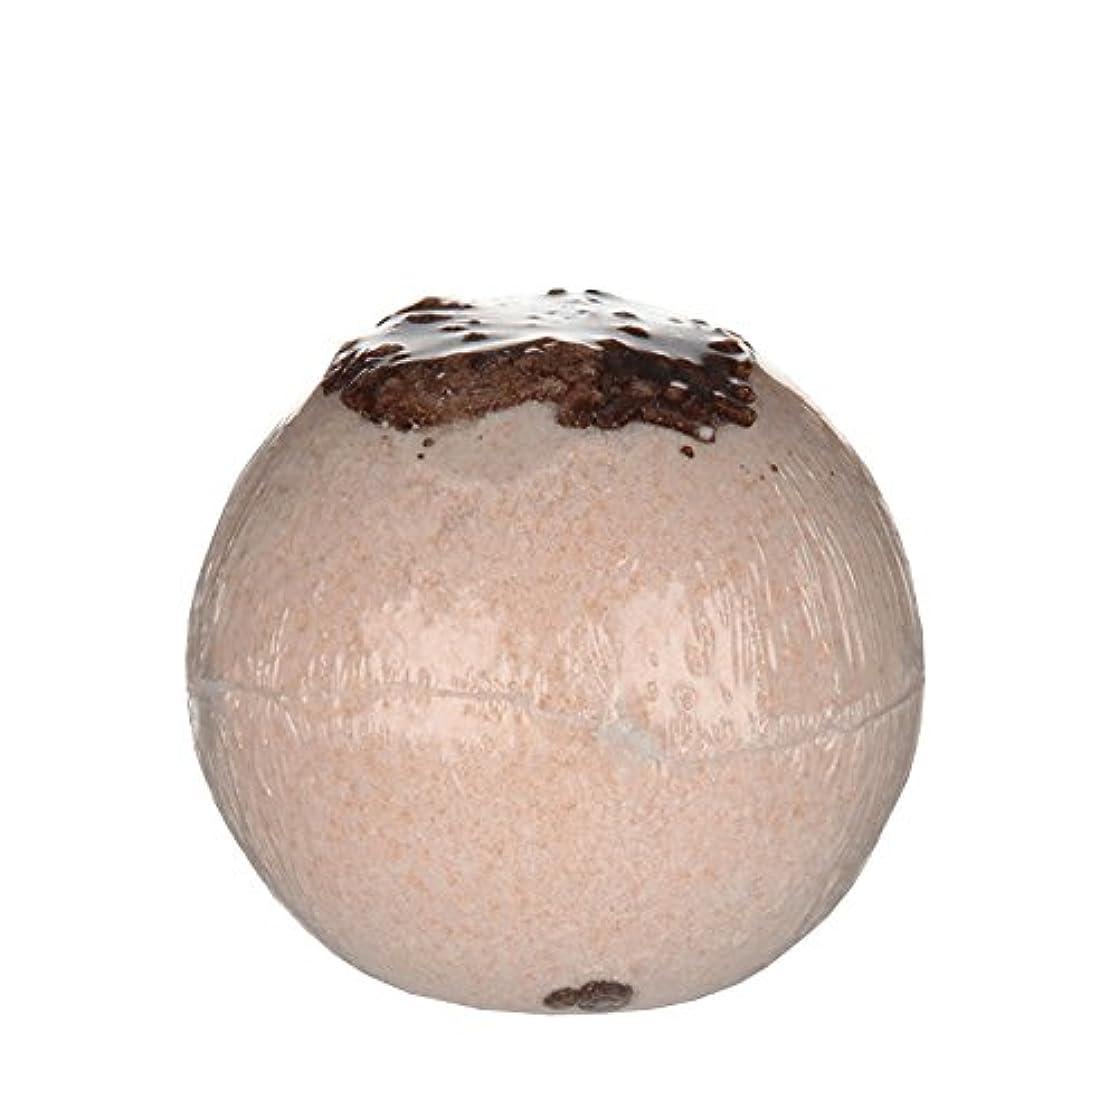 Treets Bath Ball Coconut Chocolate 170g (Pack of 6) - Treetsバスボールココナッツチョコレート170グラム (x6) [並行輸入品]